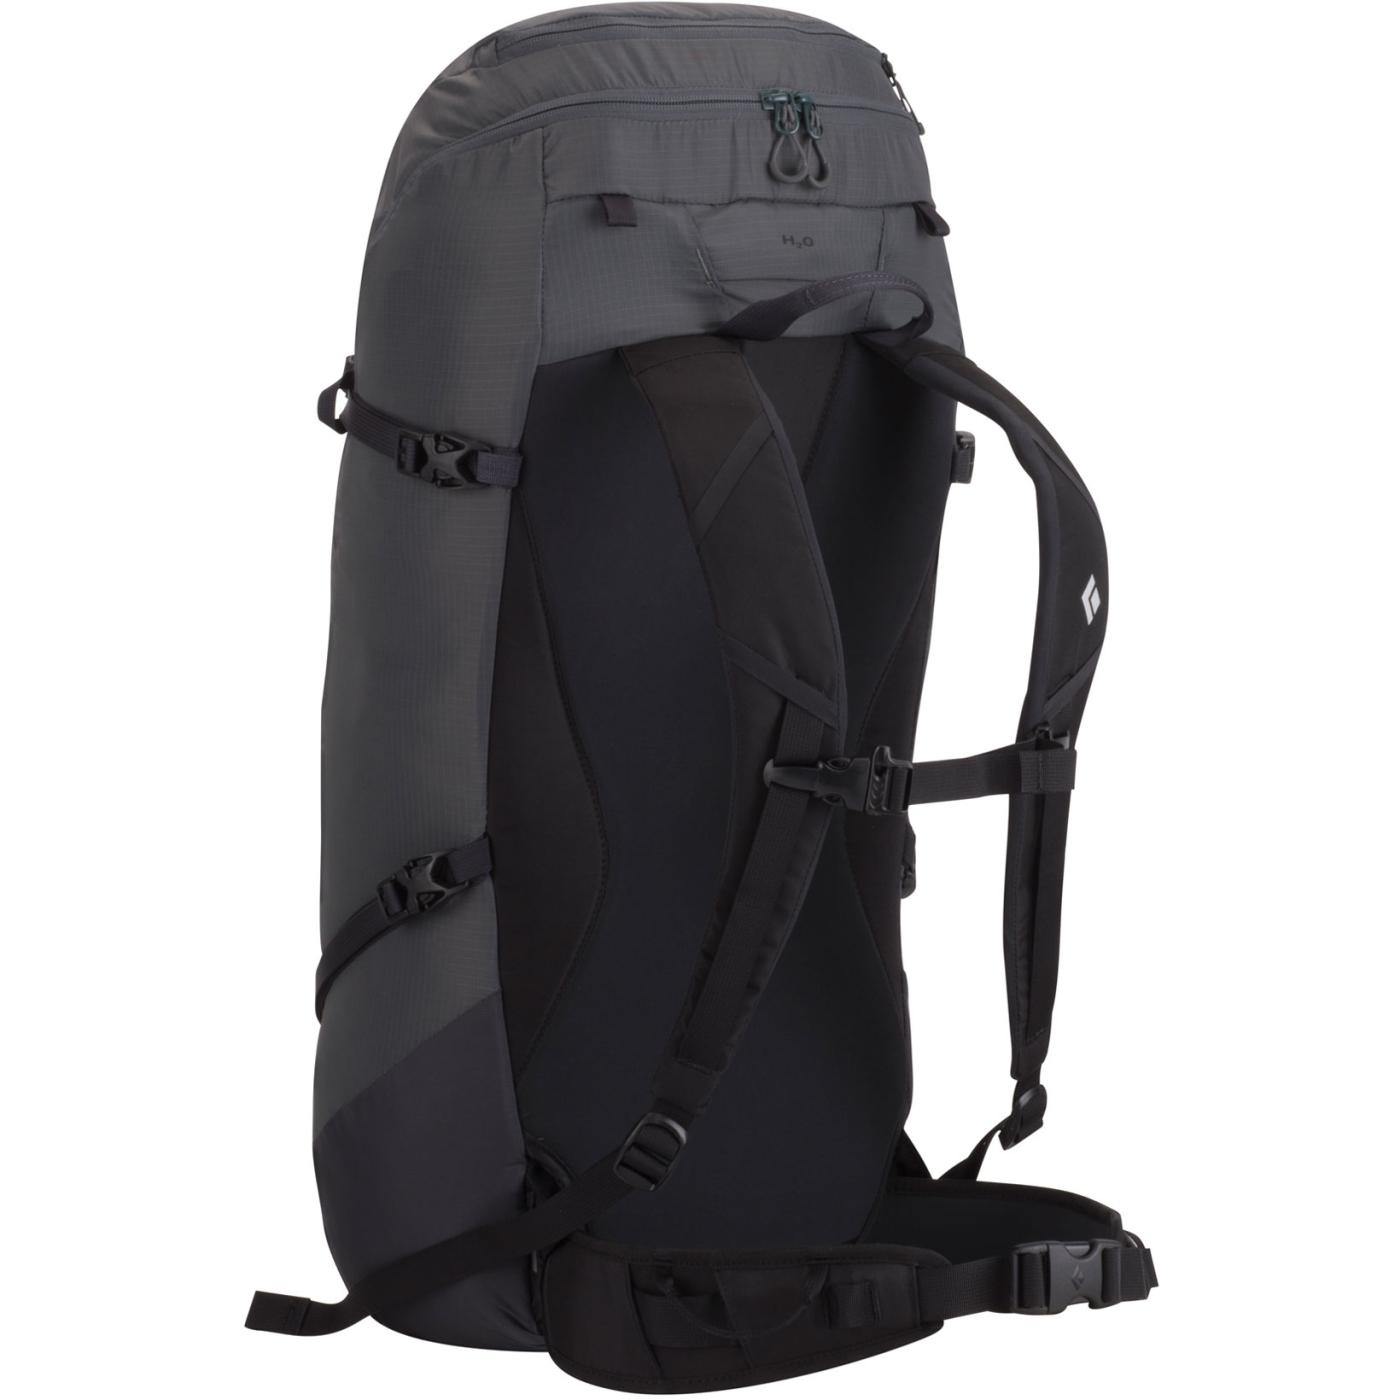 Image of Black Diamond Speed Zip 33 Backpack - Graphite